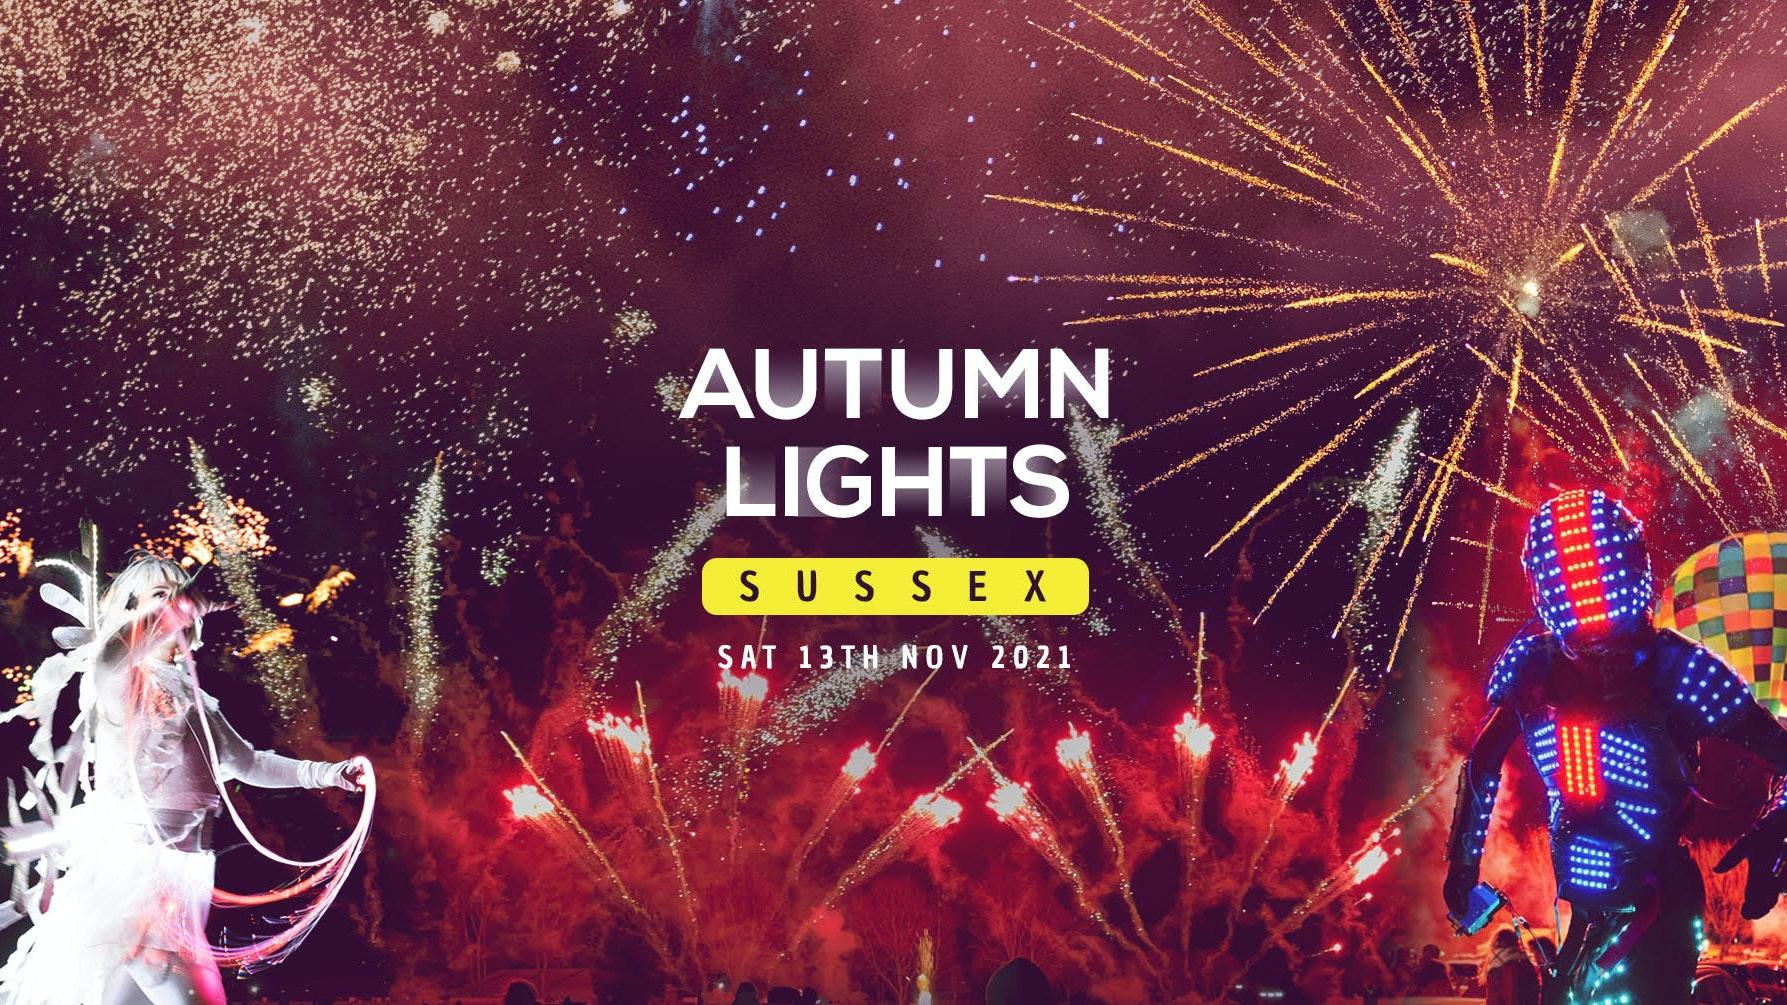 Autumn Lights – Sussex 2021